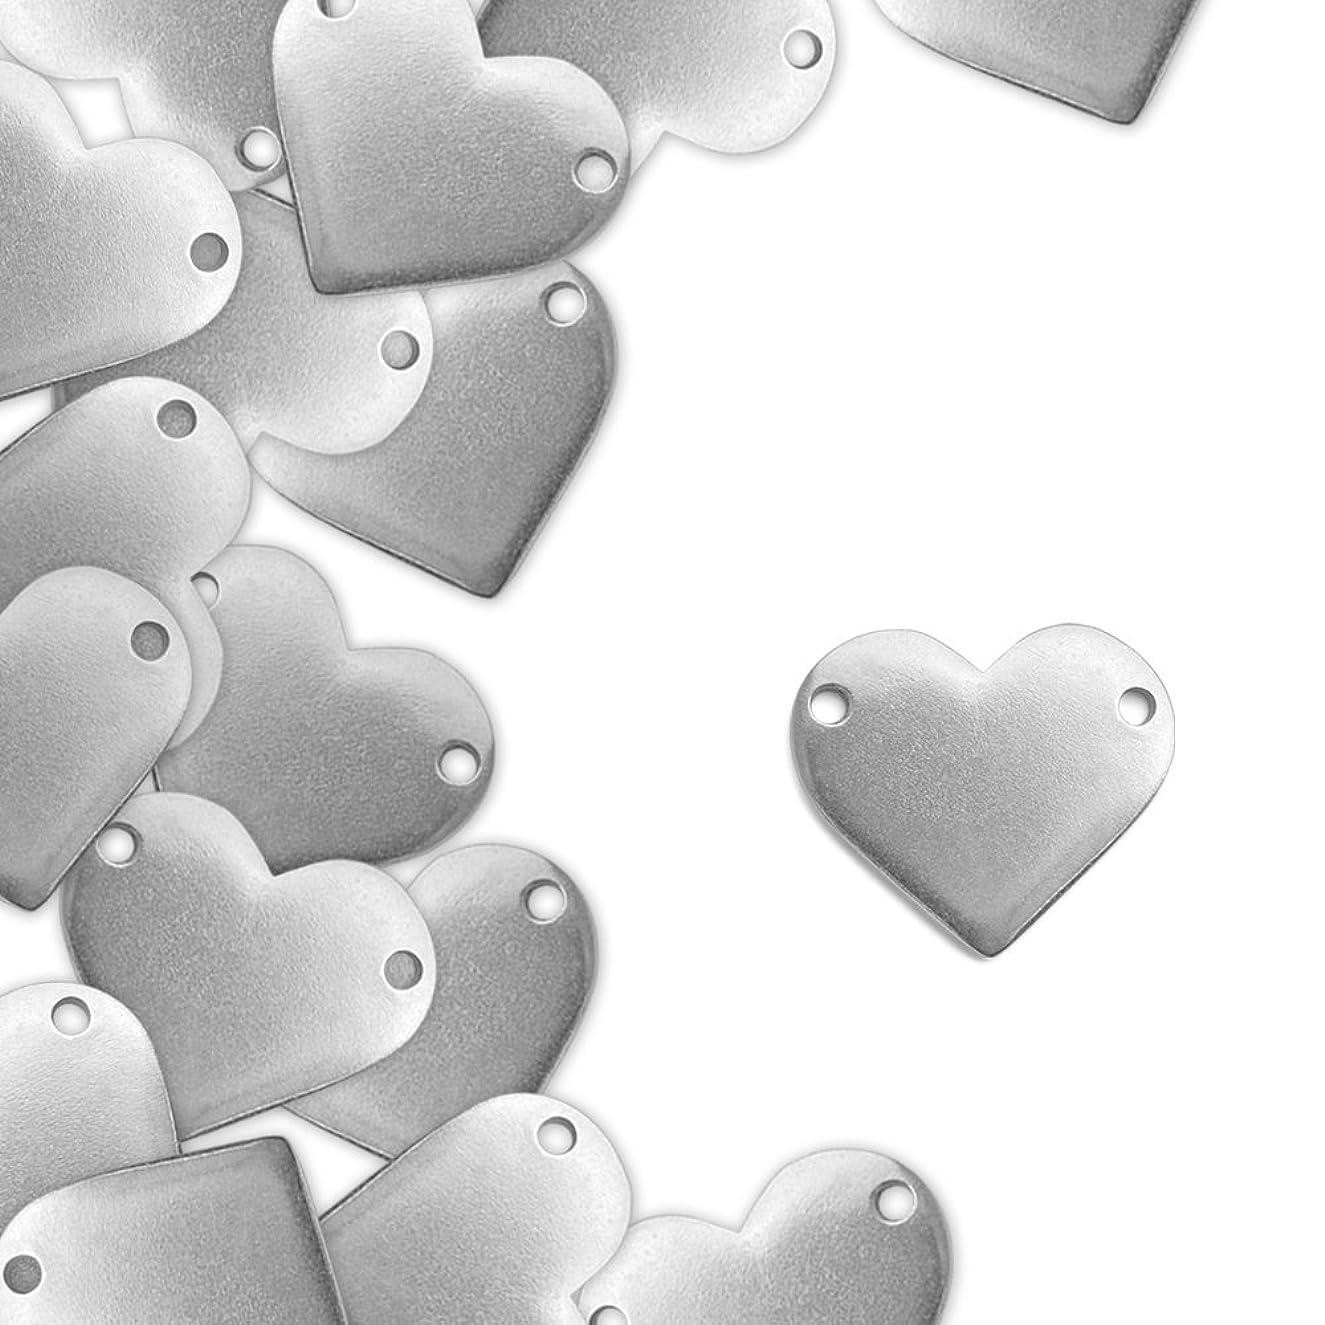 ImpressArt, Pewter Stamping Blanks, Heart w/ Holes, 1